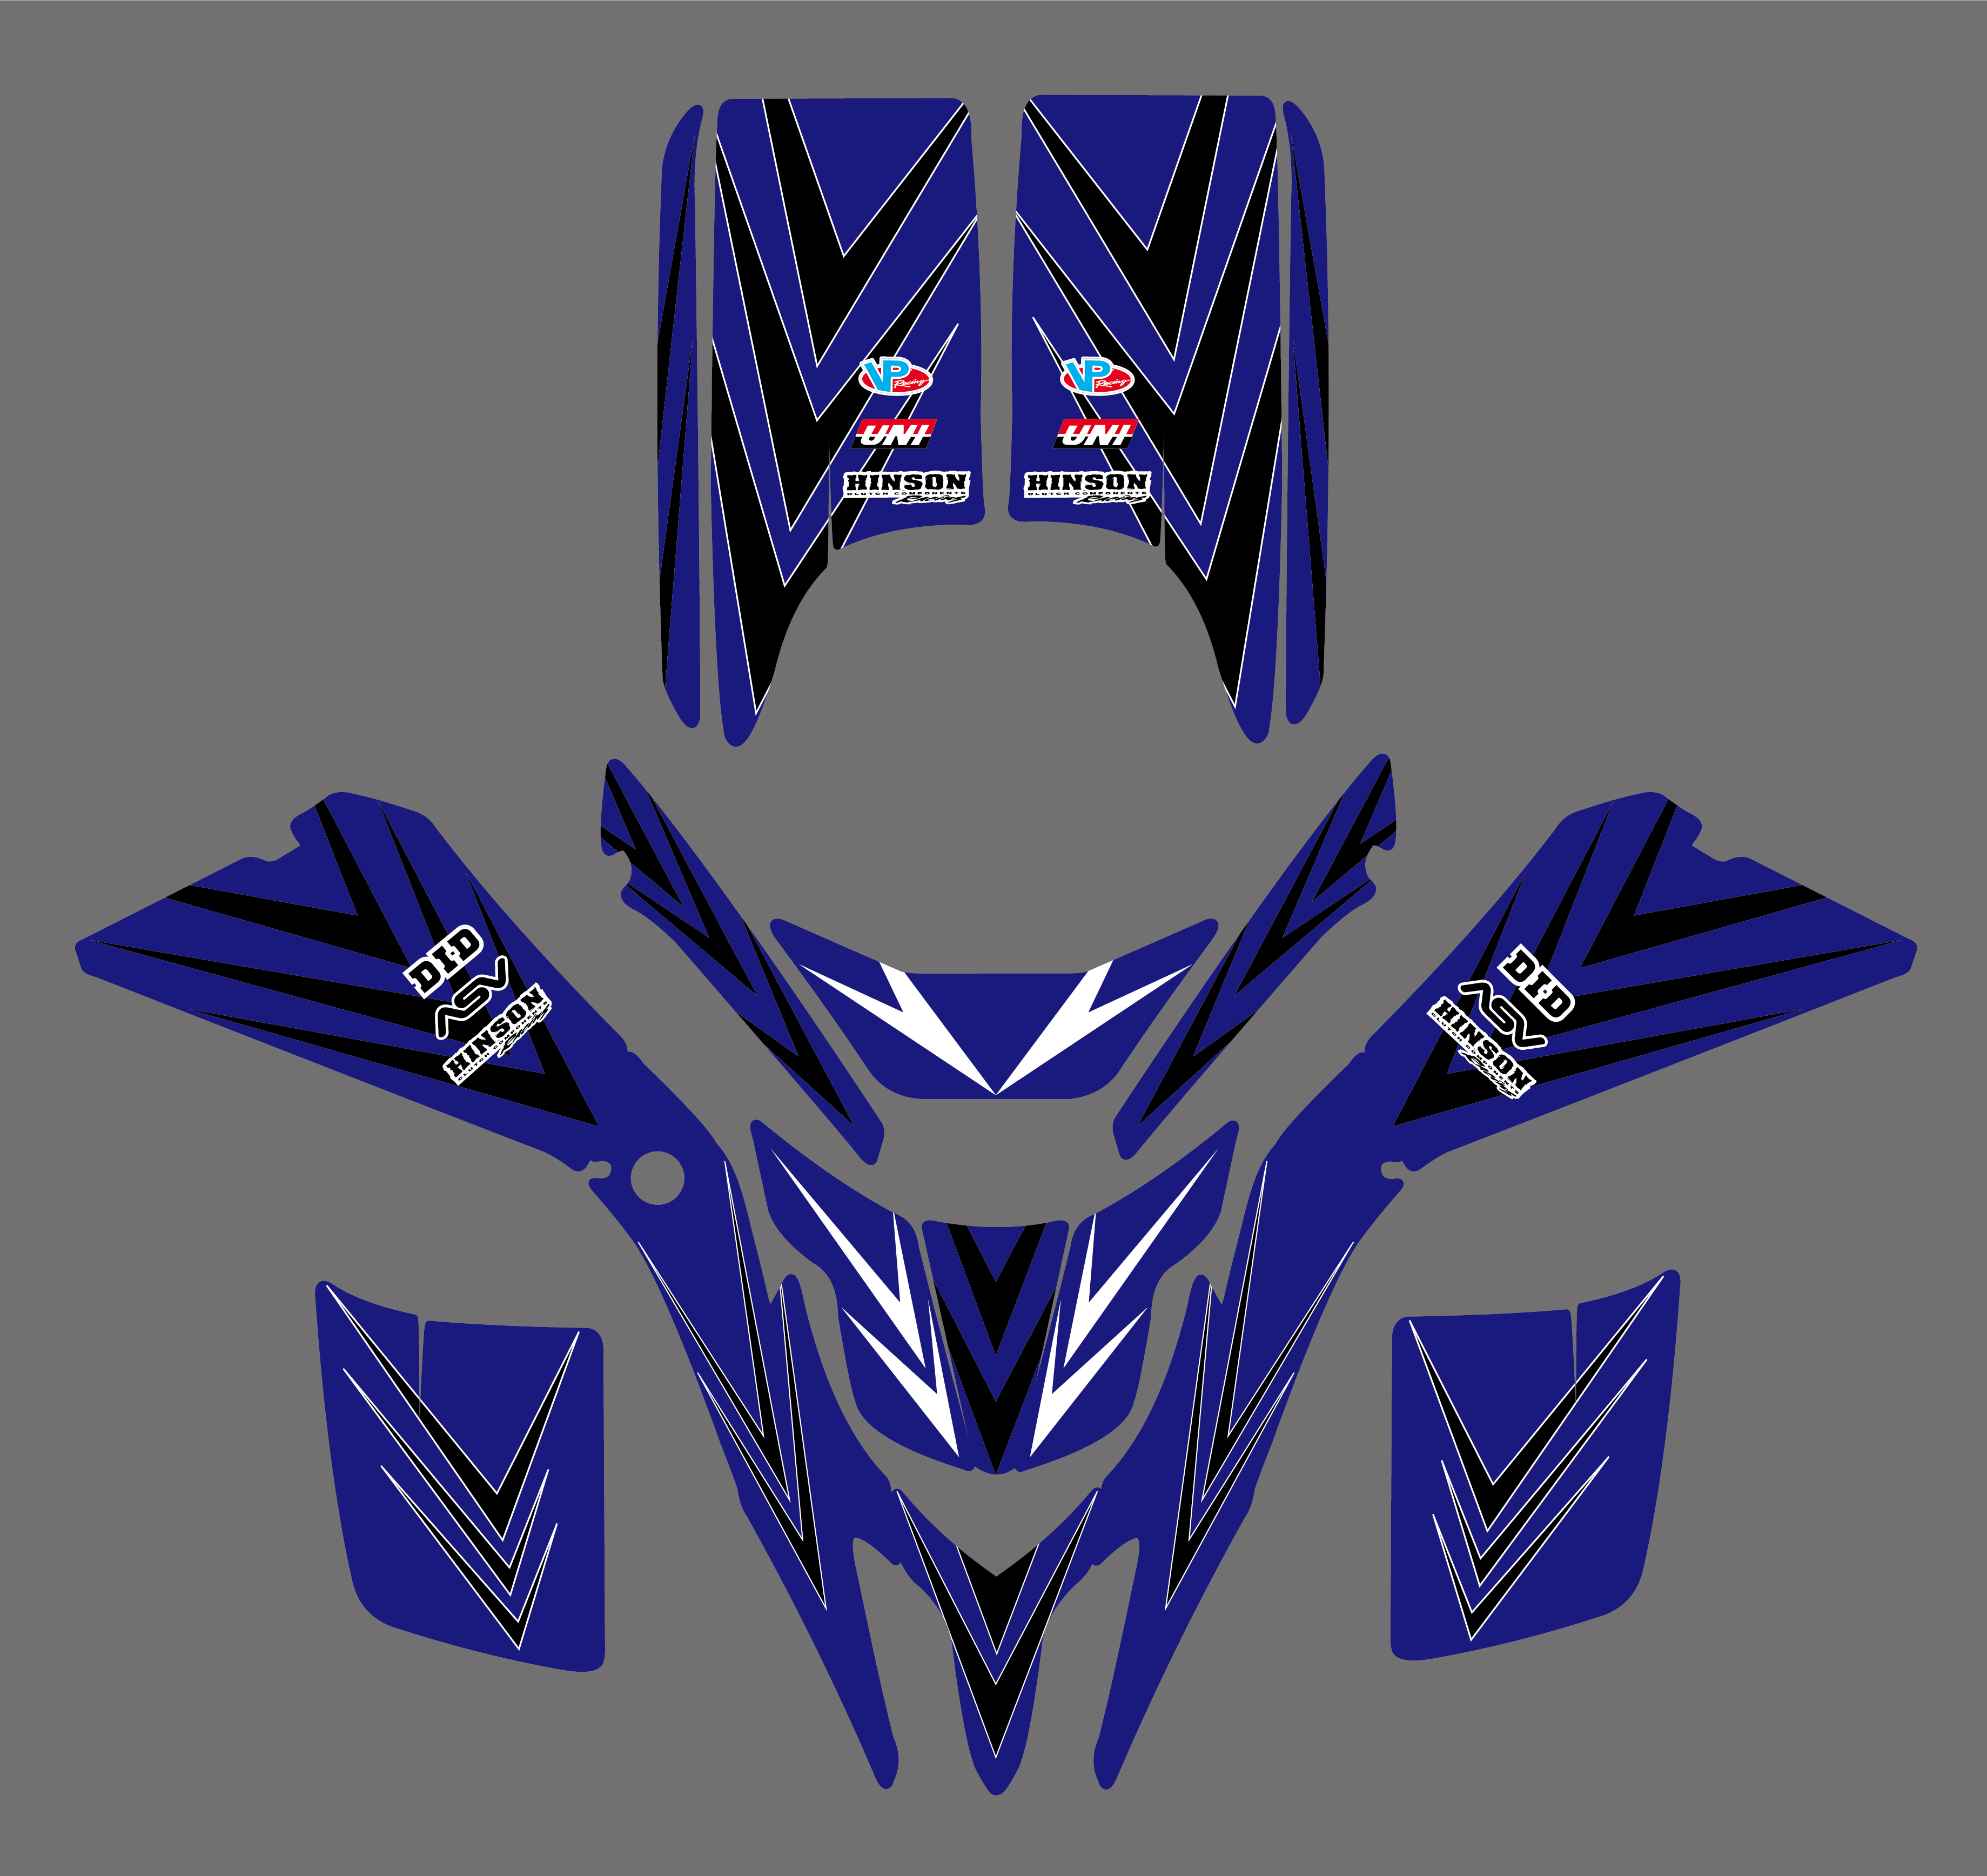 YFM 250 YFM250 Beartracker 250 2001 2002 2003 2004 Cyleto Front Brake Pads for YAMAHA YFS 200 YFS200 Blaster 2003 2004 2005 2006